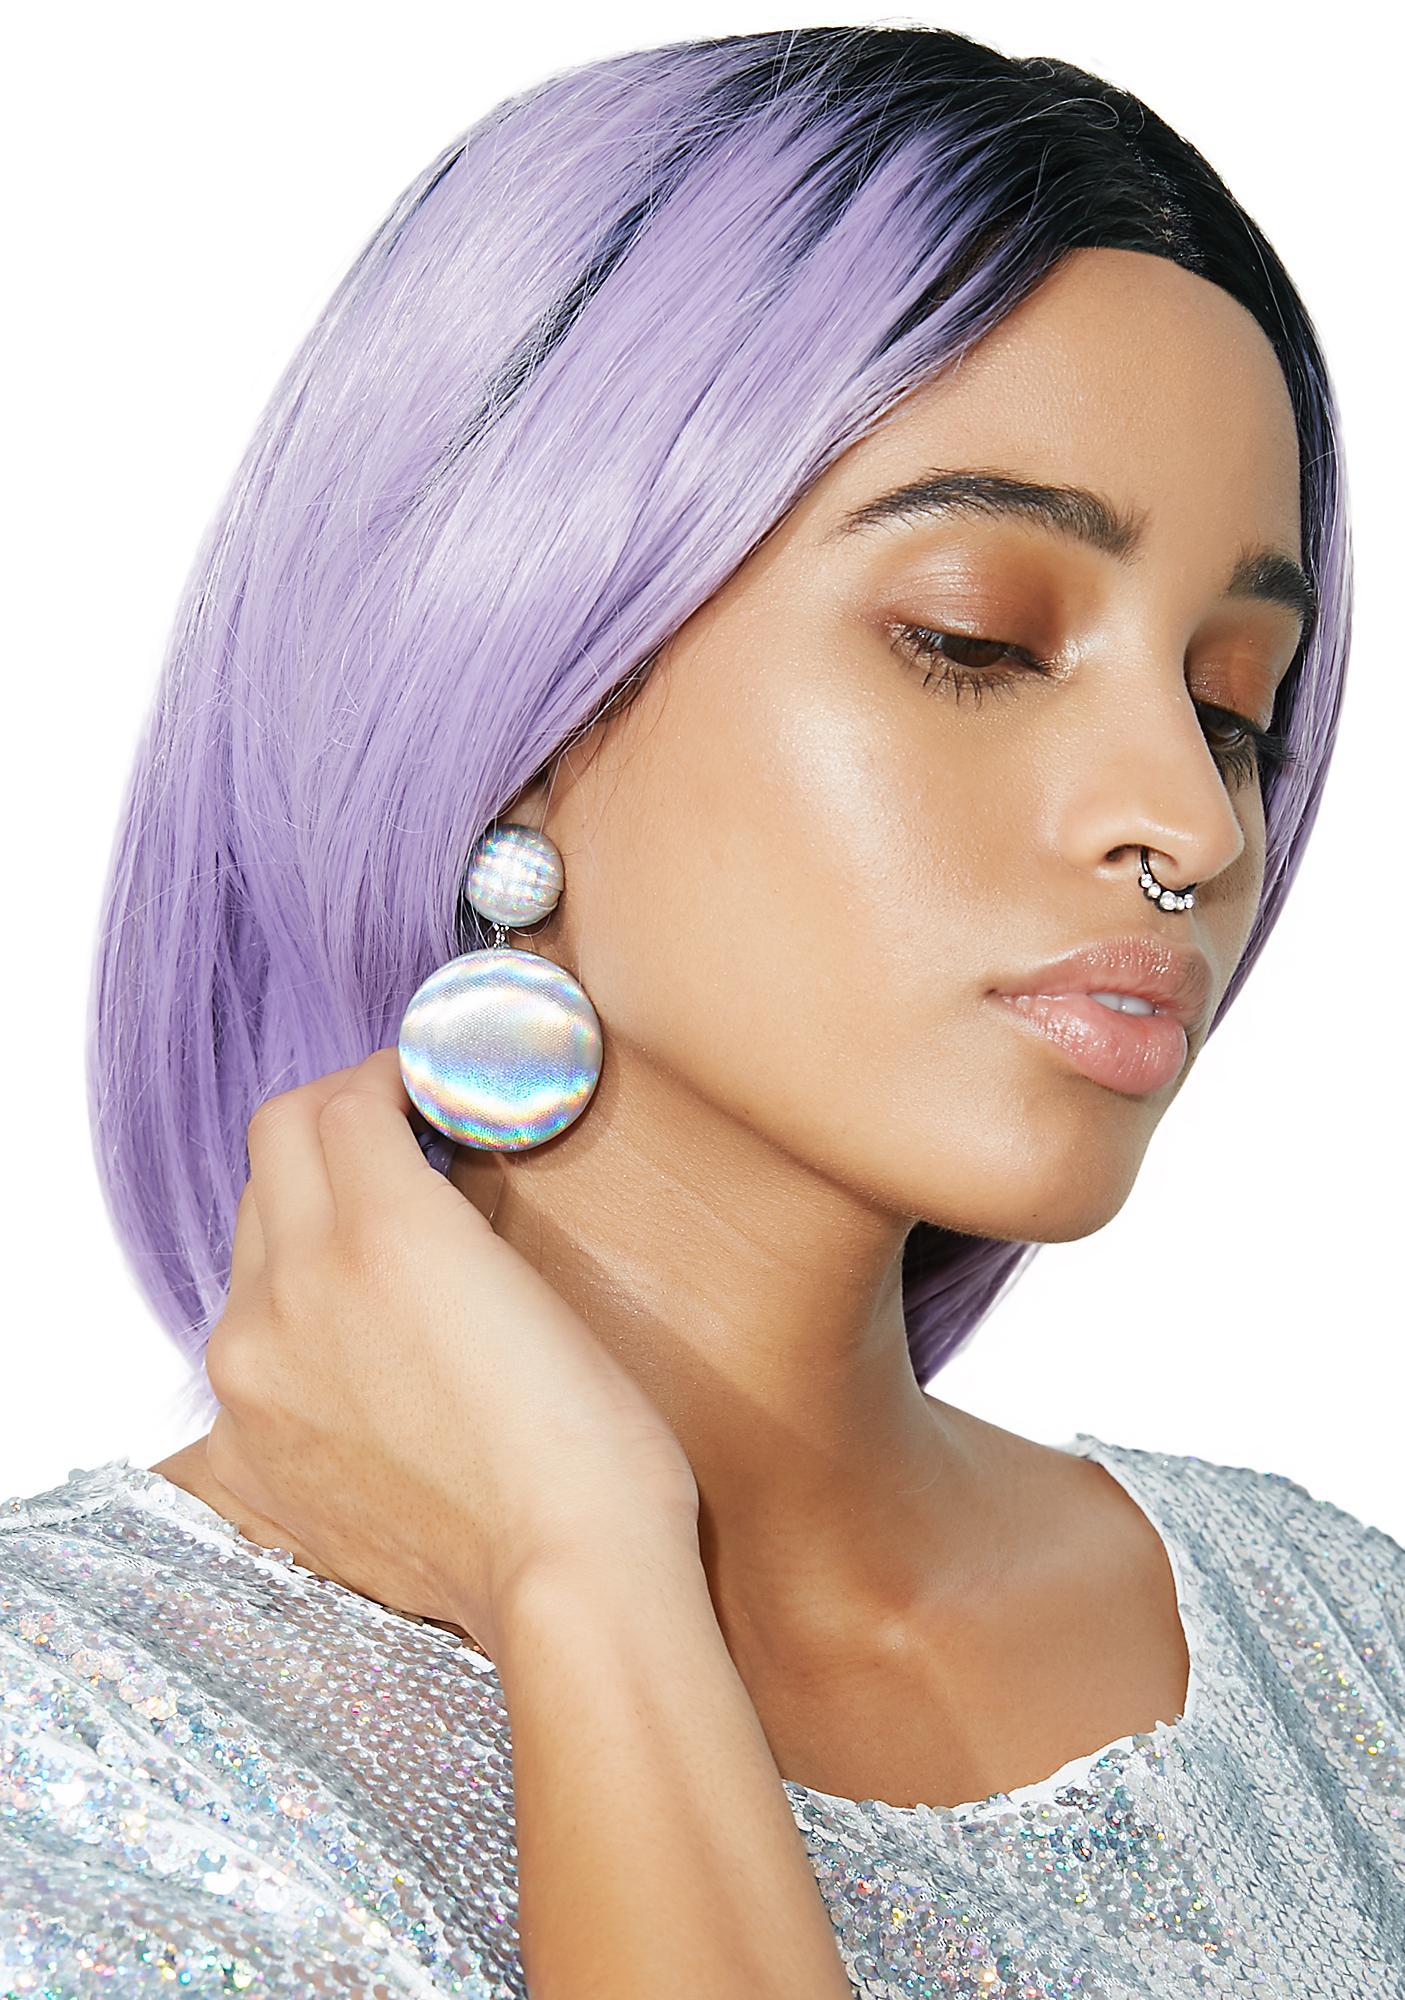 Around The World Ball Earrings